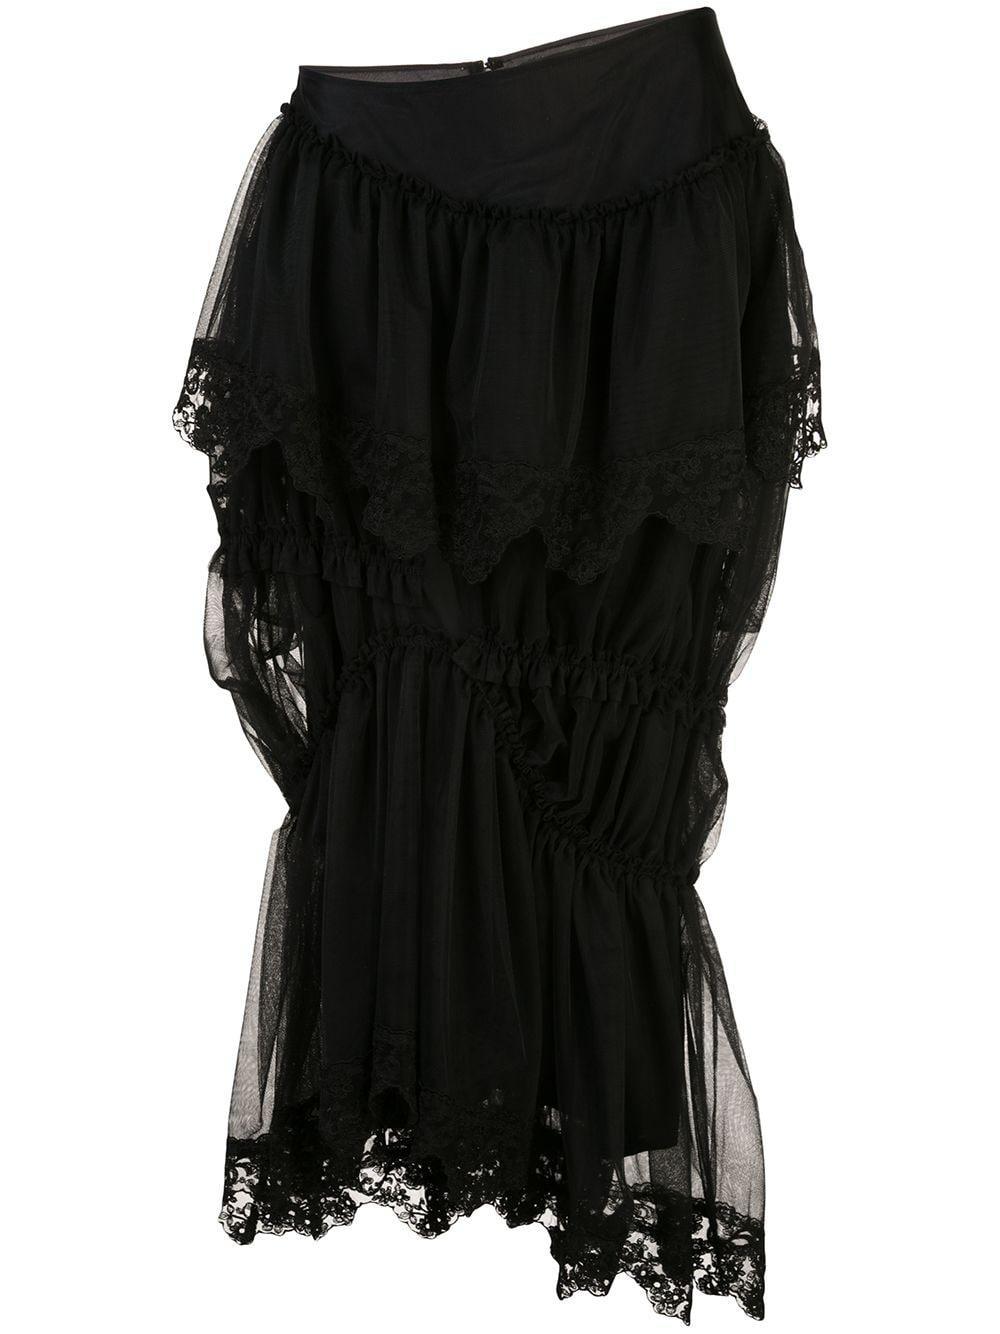 Simone Rocha юбка асимметричн��го кроя со вставками из тюля